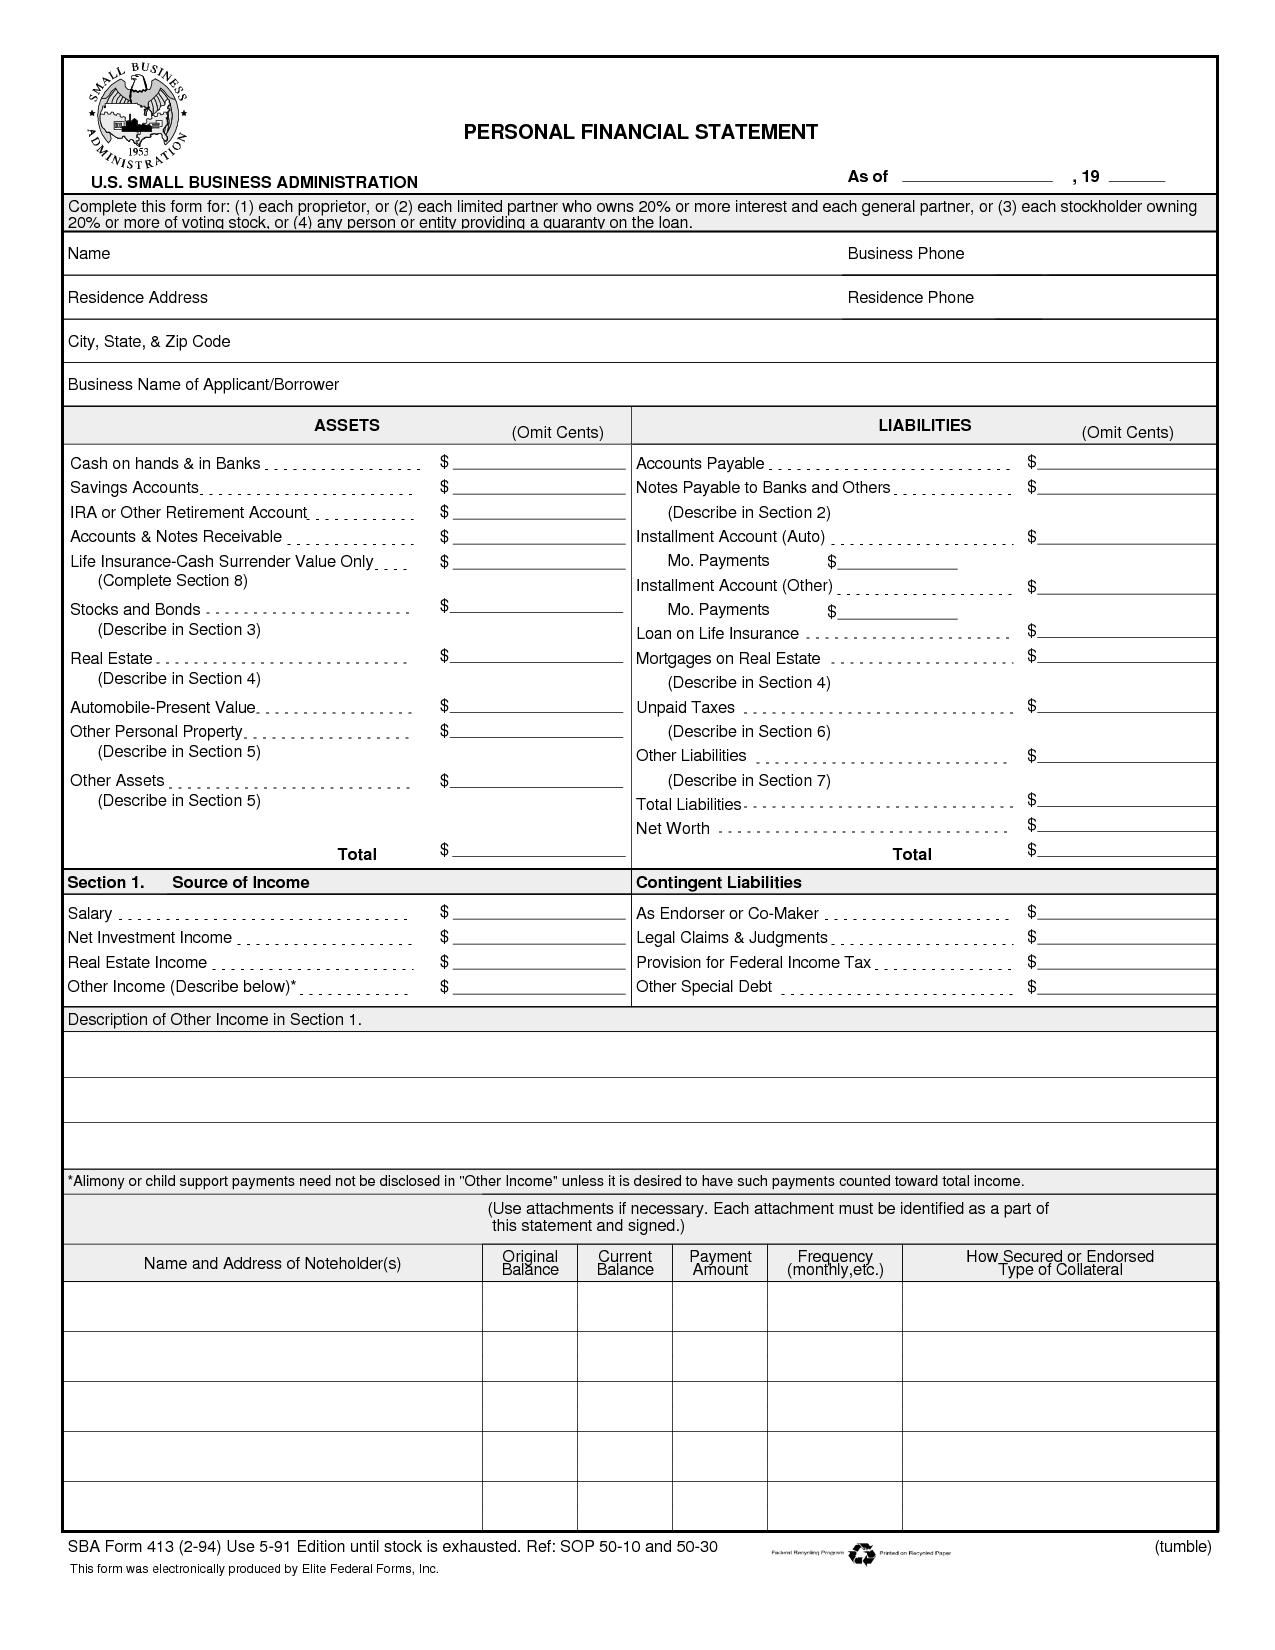 Child Support Spreadsheet